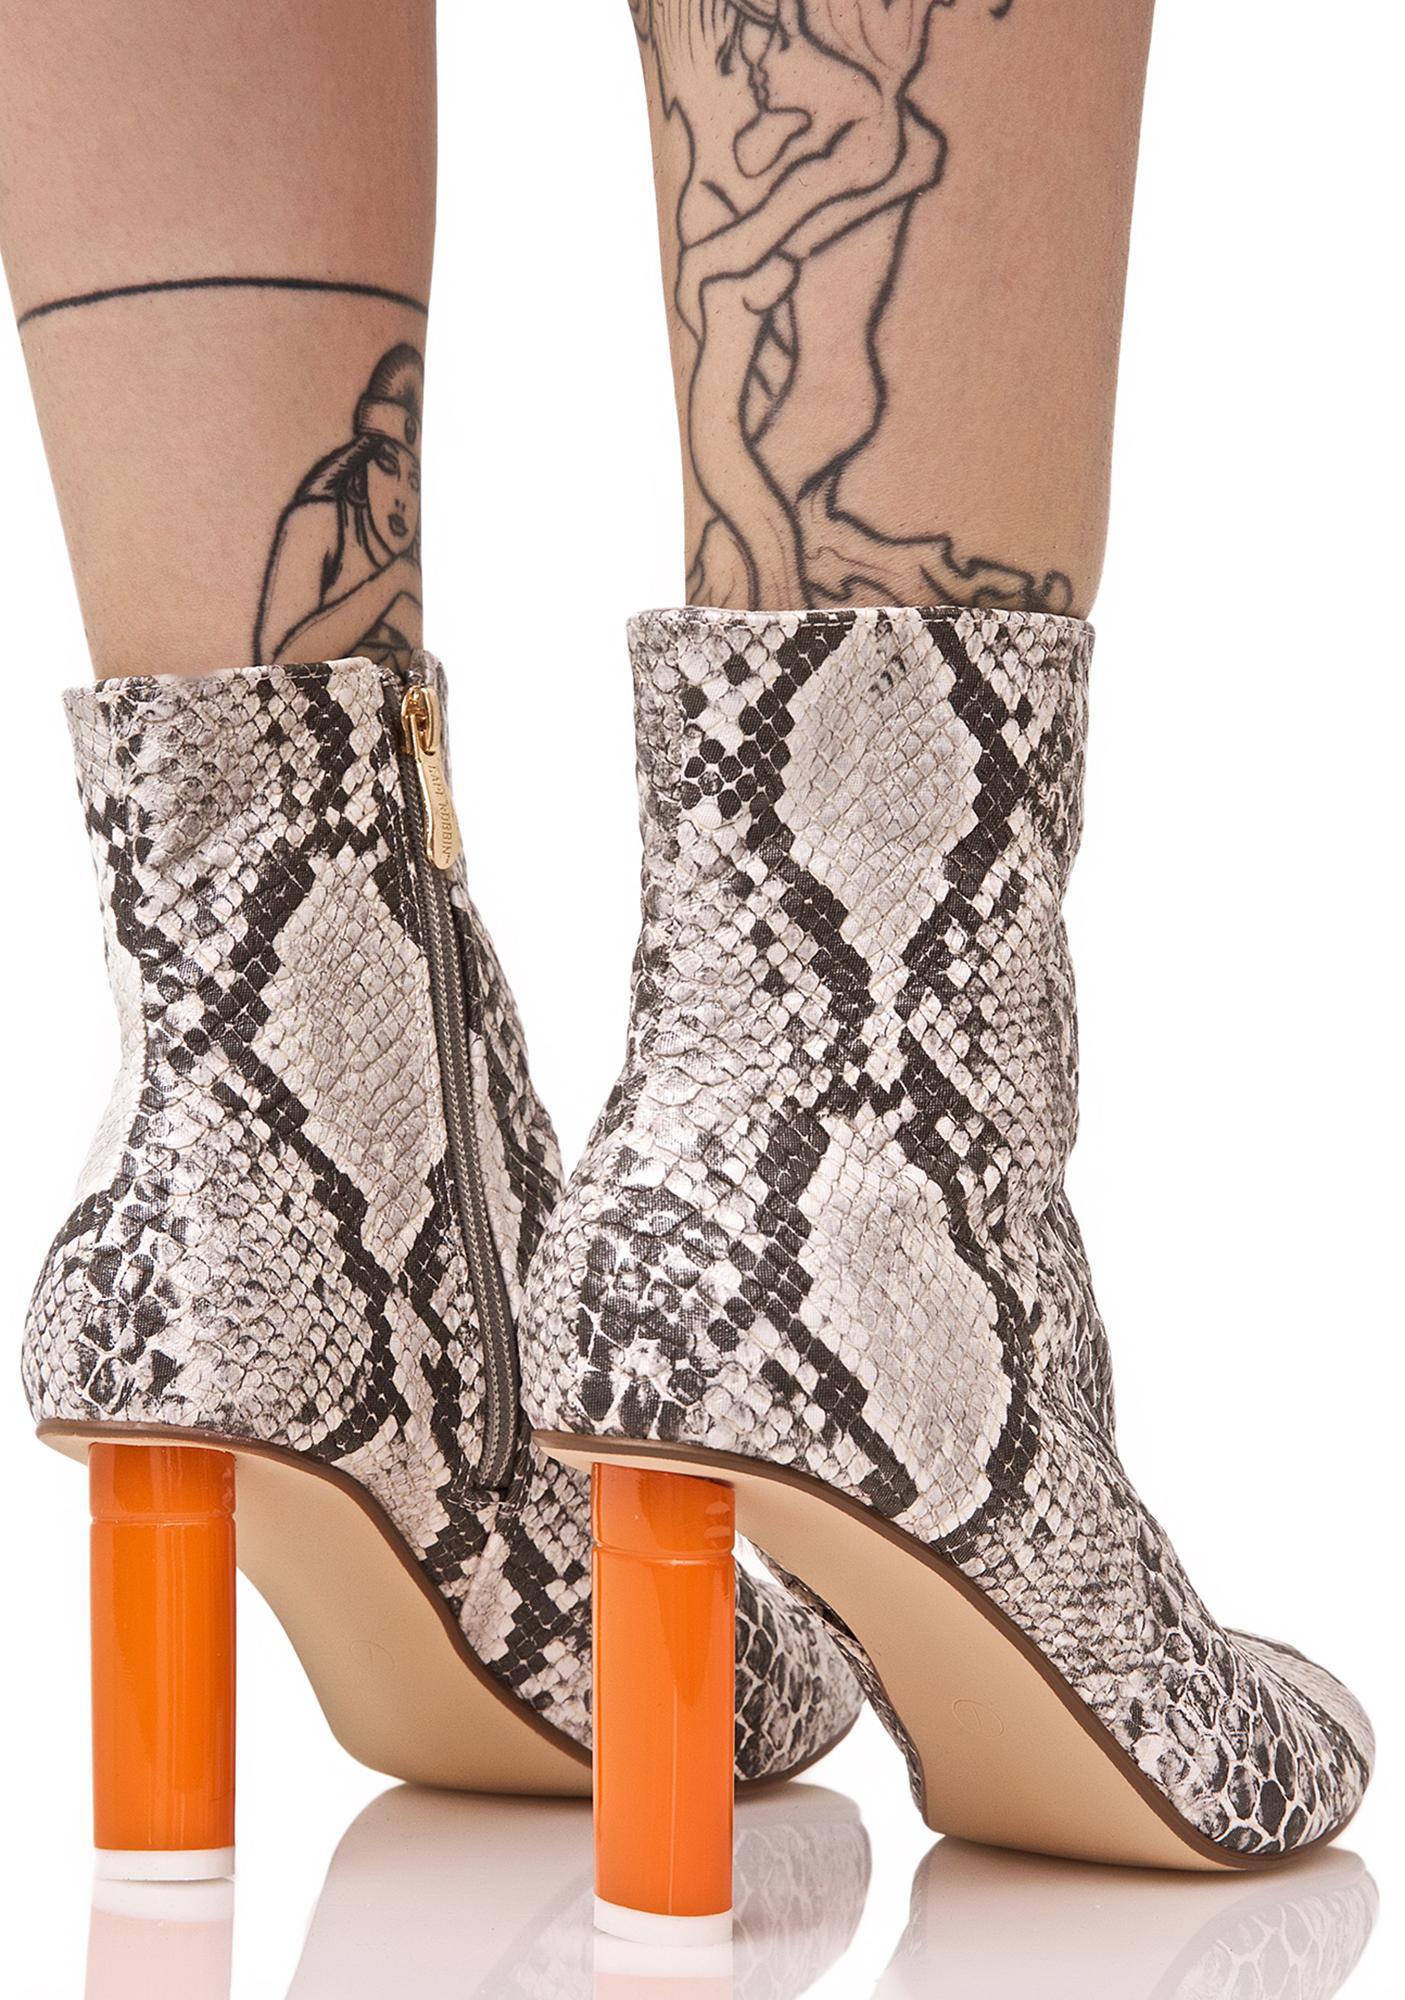 Venom Ankle Boots